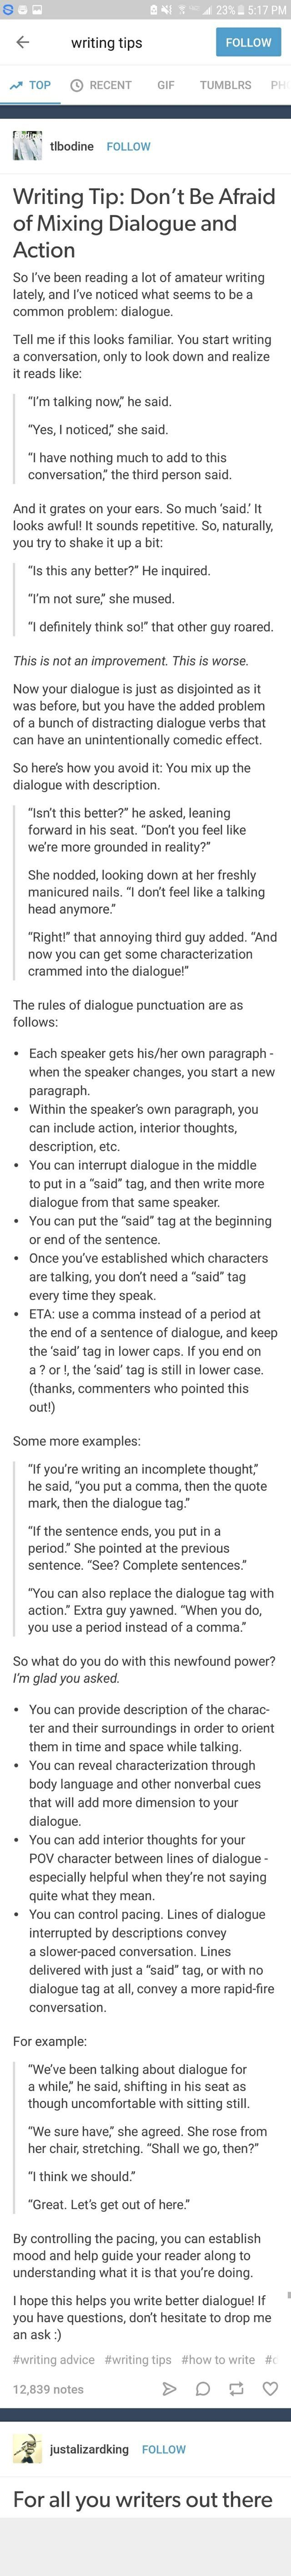 Writing tips - dialog